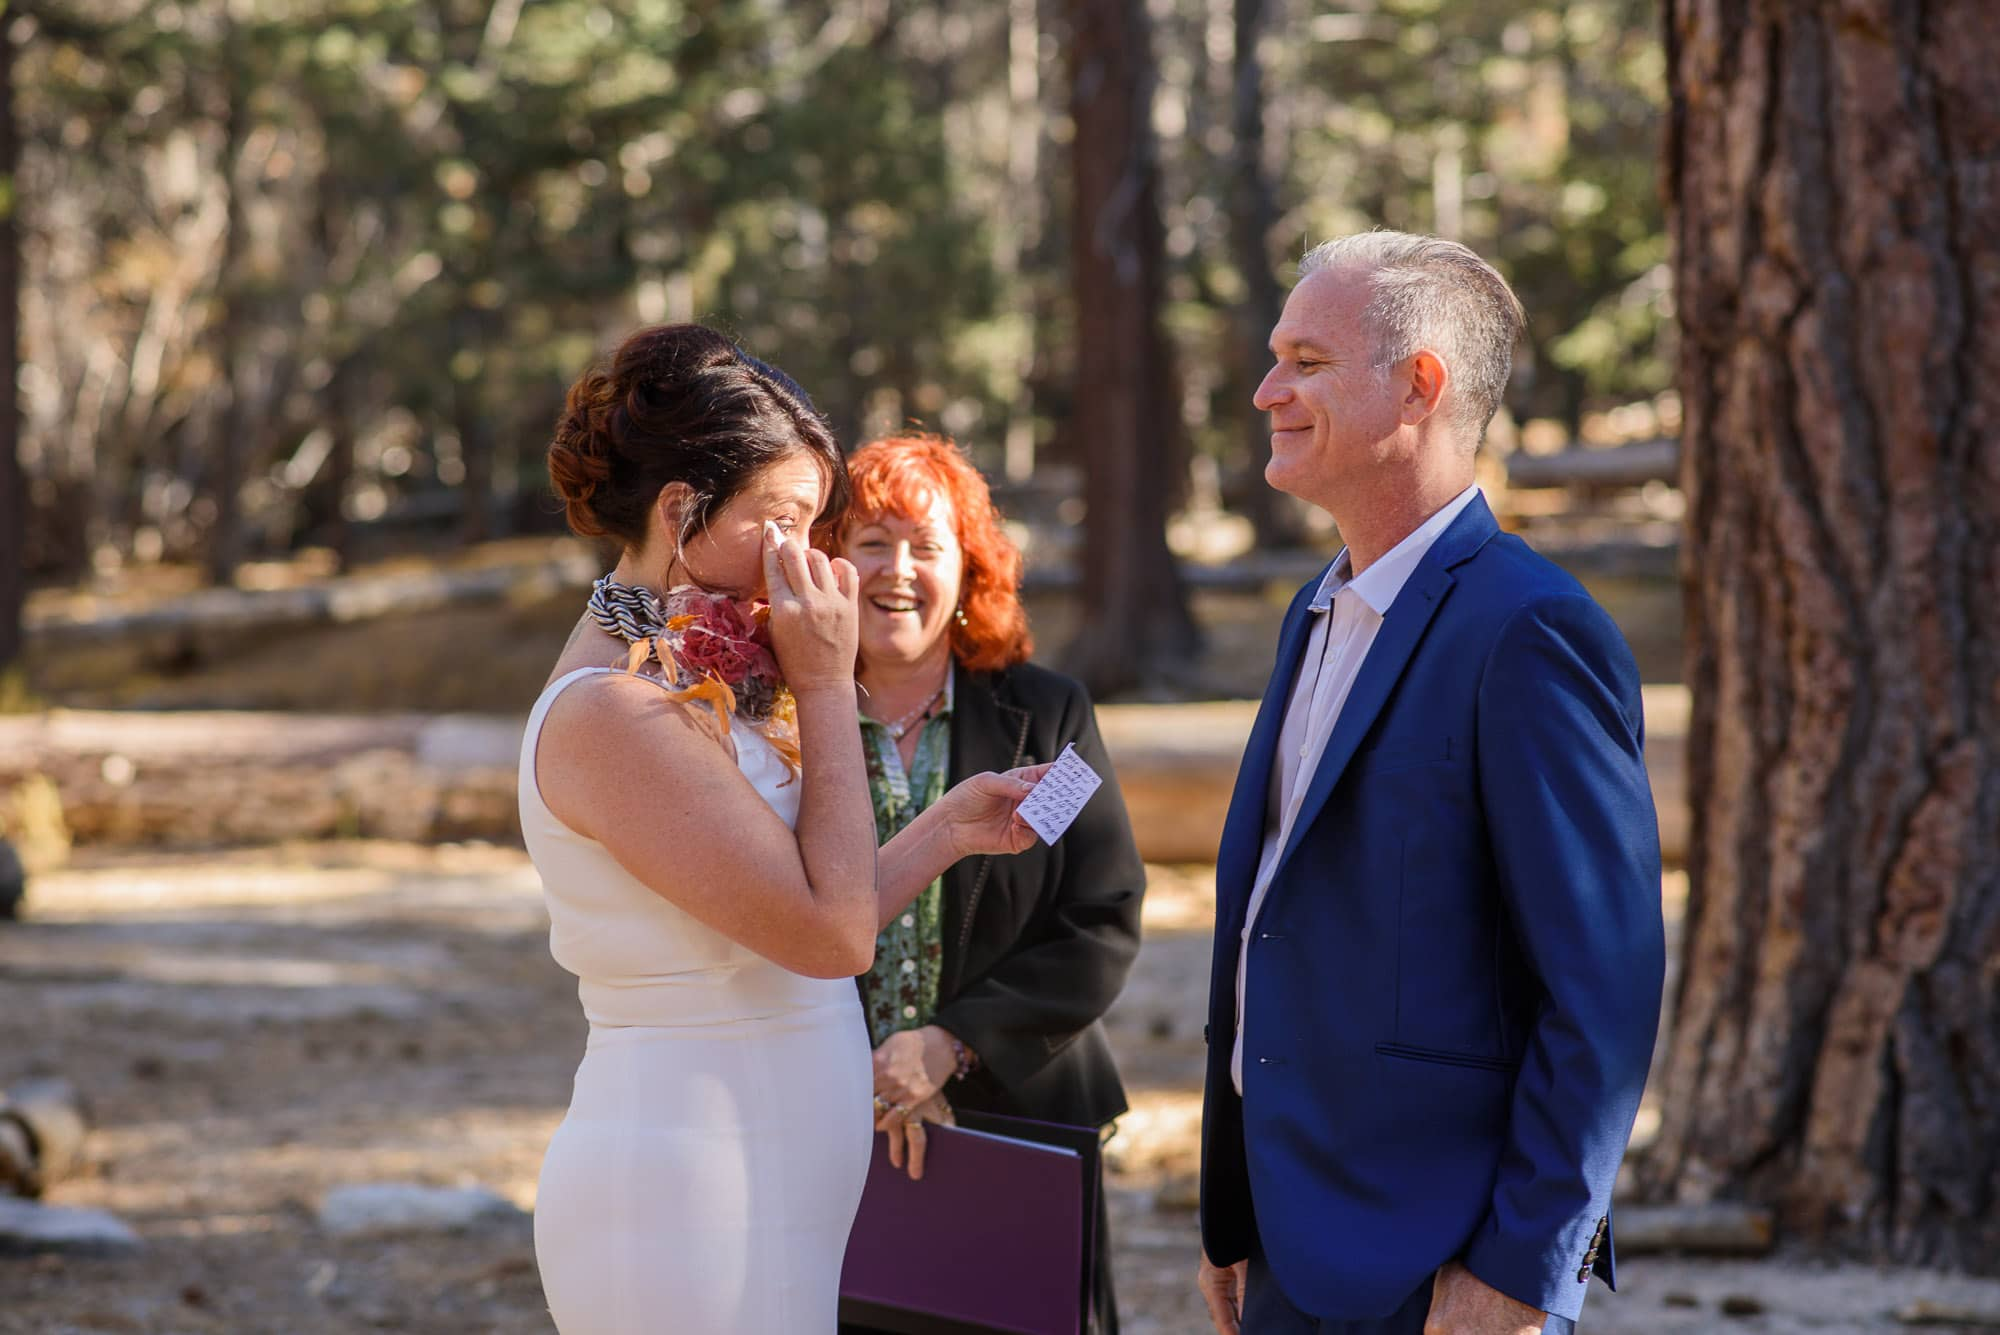 016_Alan_and_Heidi_Palm_Springs_Tram_Wedding